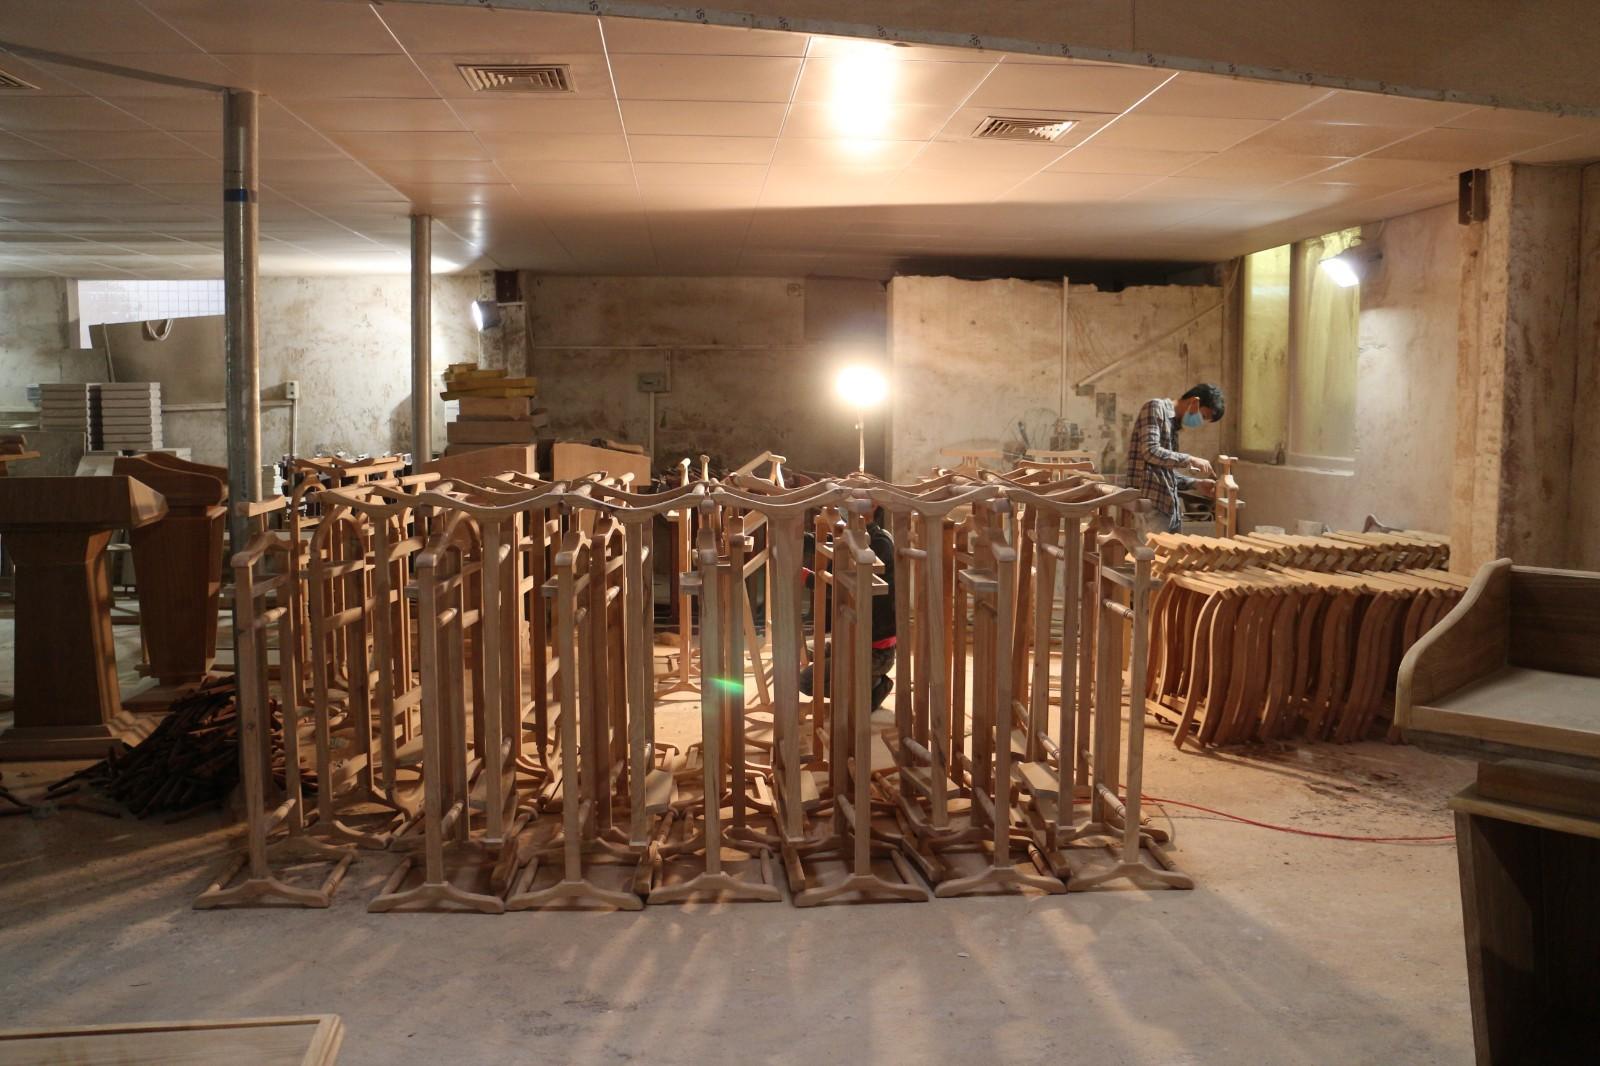 Fenghe-Oem Wooden Pulpit Manufacturer, Portable Pulpit Stand-3